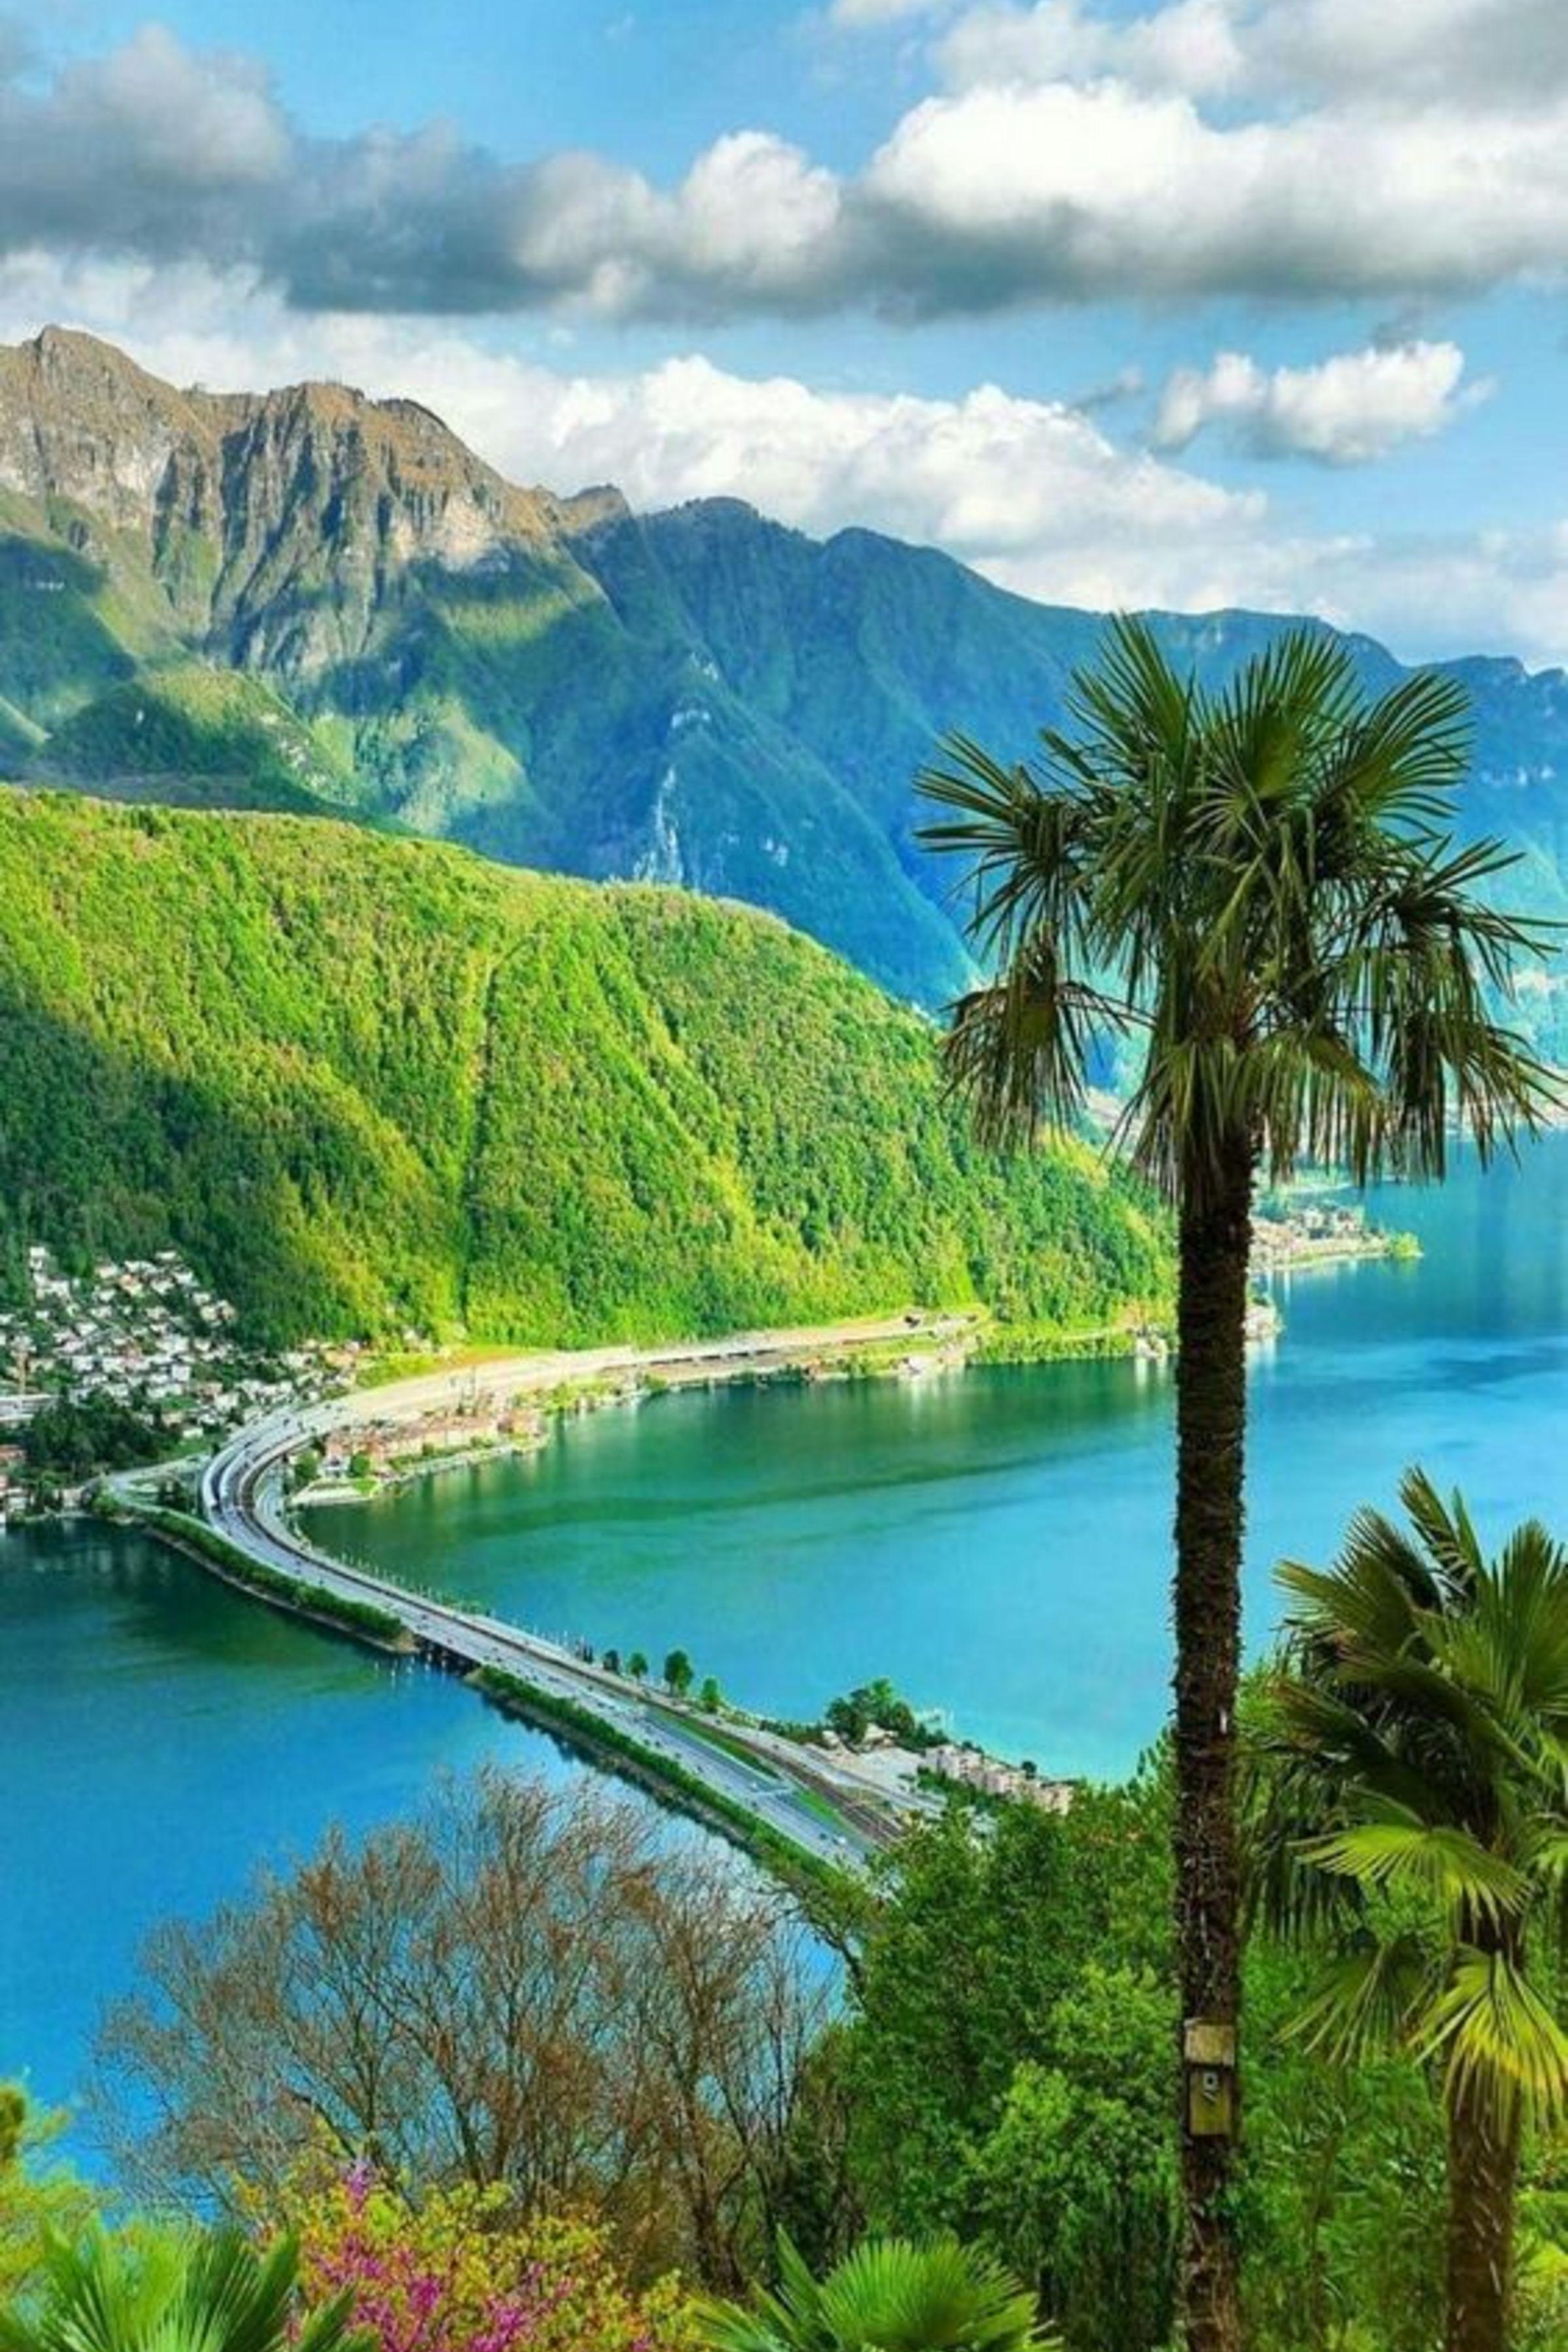 Enjoy The Palm Life Usapalm Com Beautiful Places Nature Beautiful Nature Beautiful Landscapes